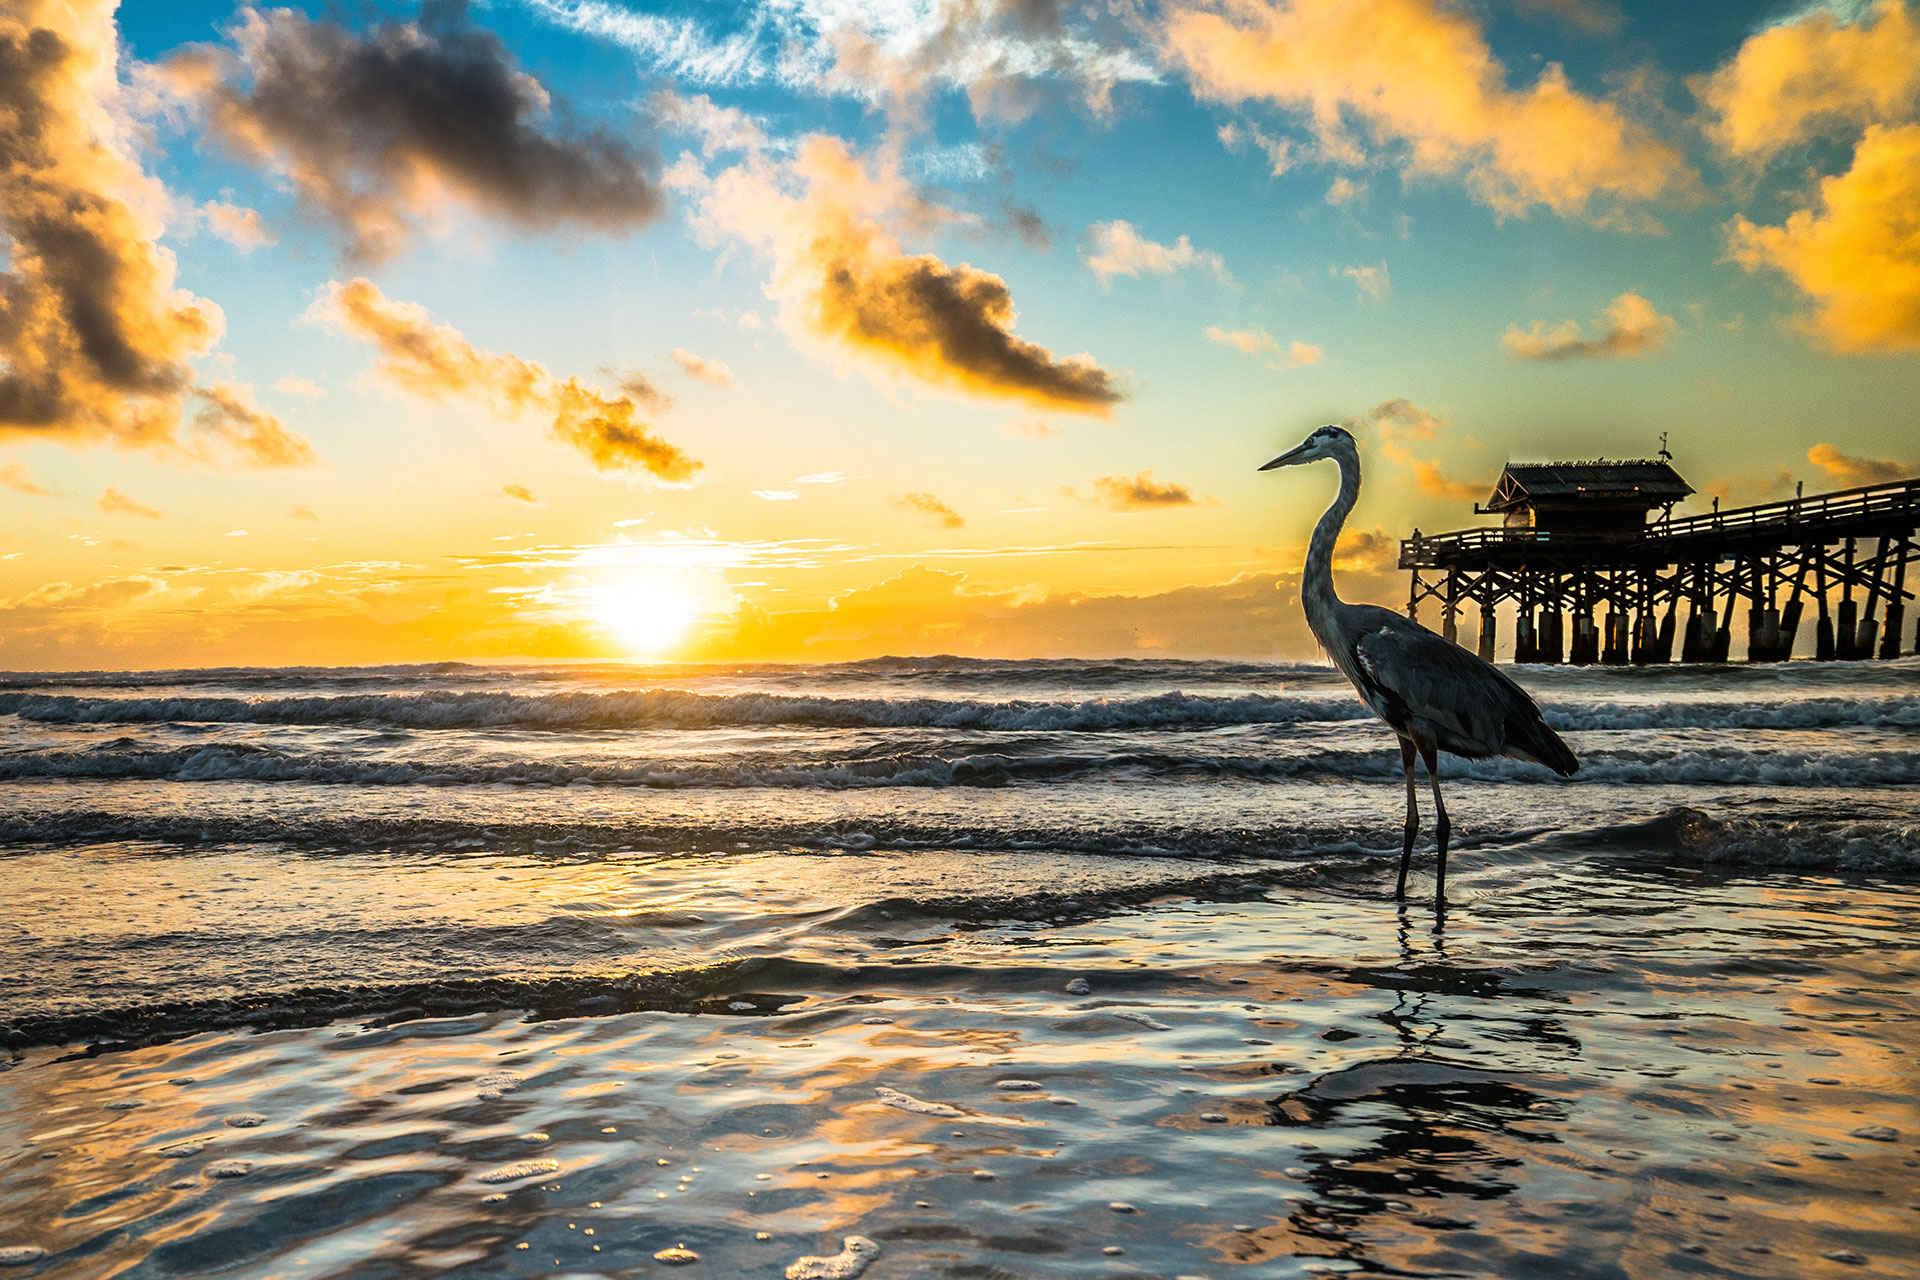 Cocoa Beach, Florida at Sunset